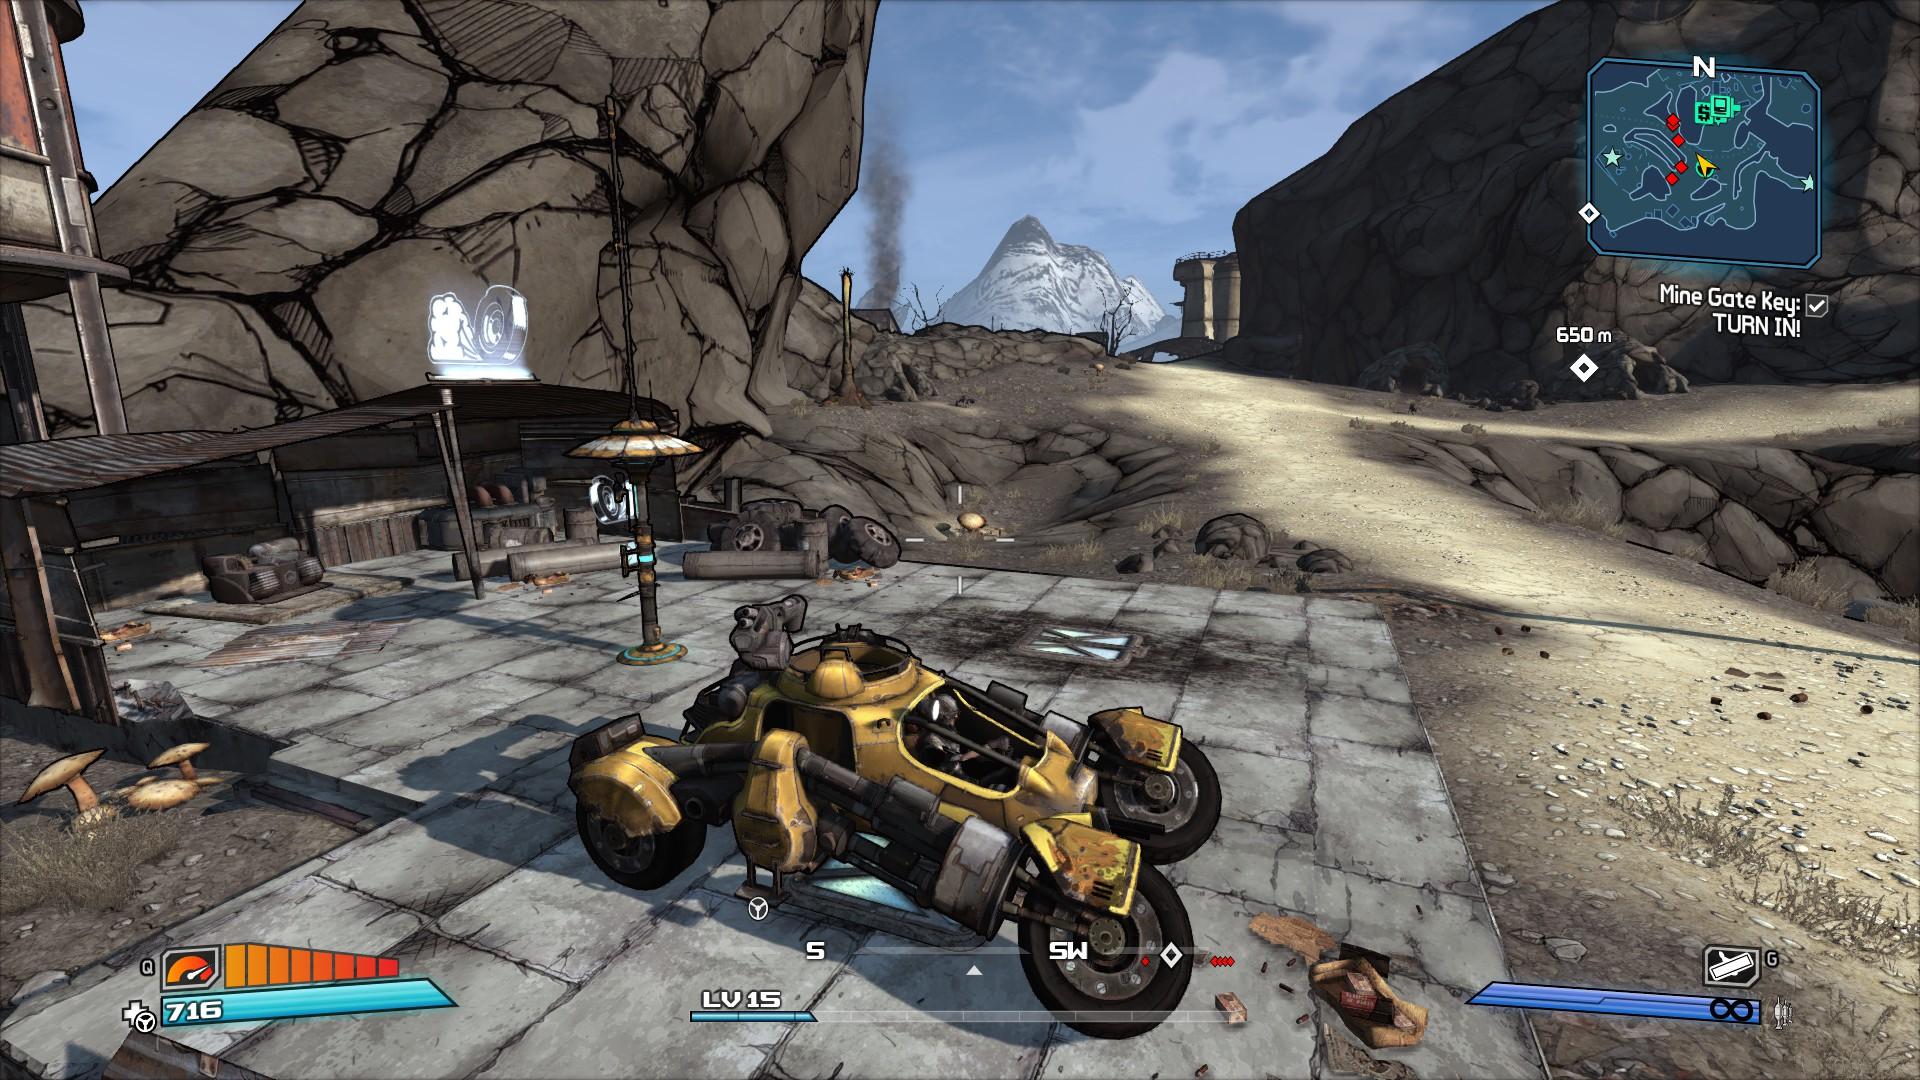 Borderlands 2 Physx Freezes Game